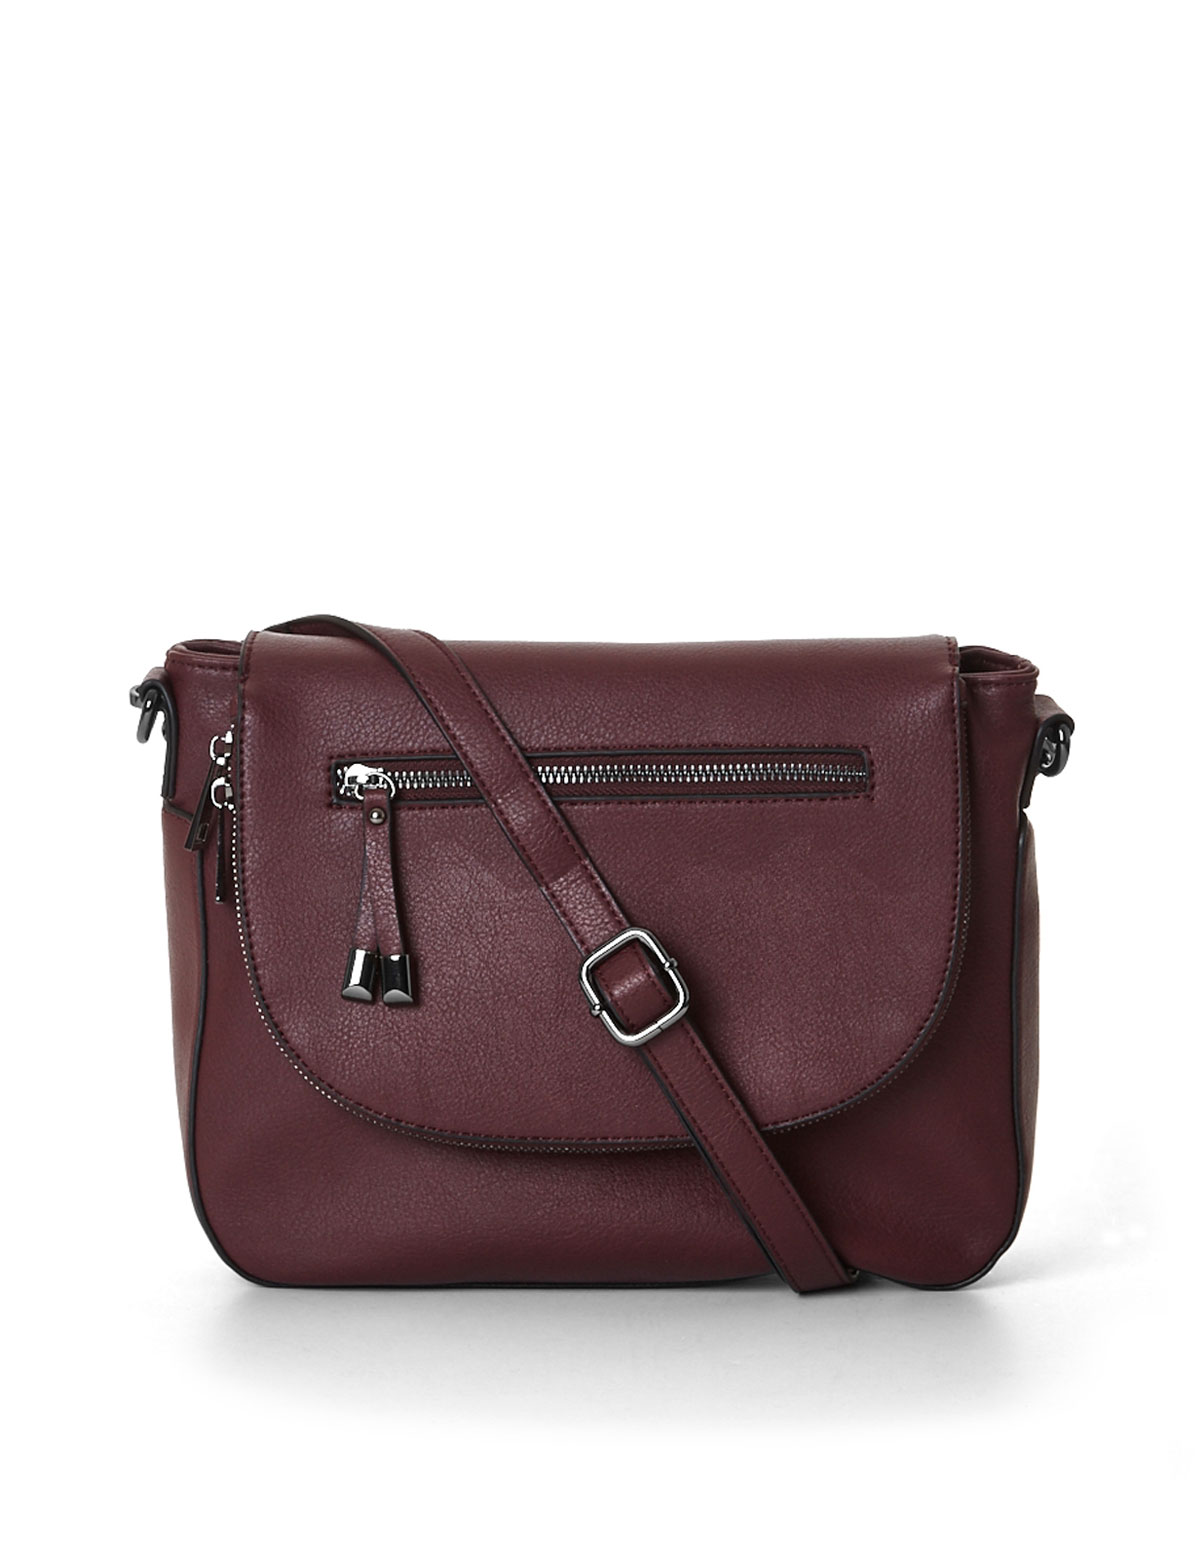 fea34cc1b7 Burgundy Cross Body Bag